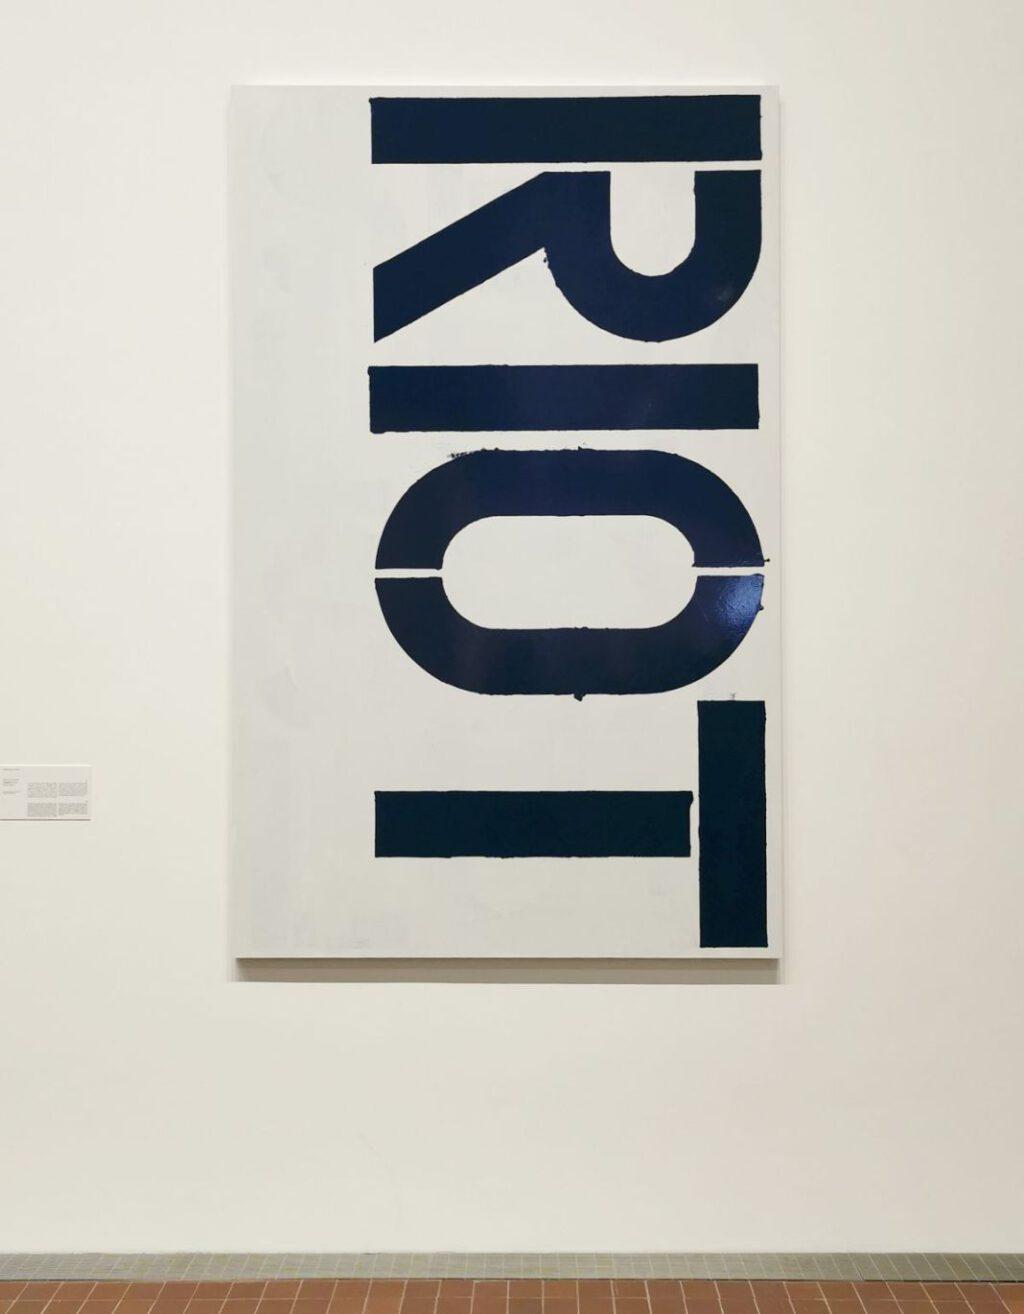 "Christopher Wool ""Untitled"" 1989-1990, enamel on aluminium"